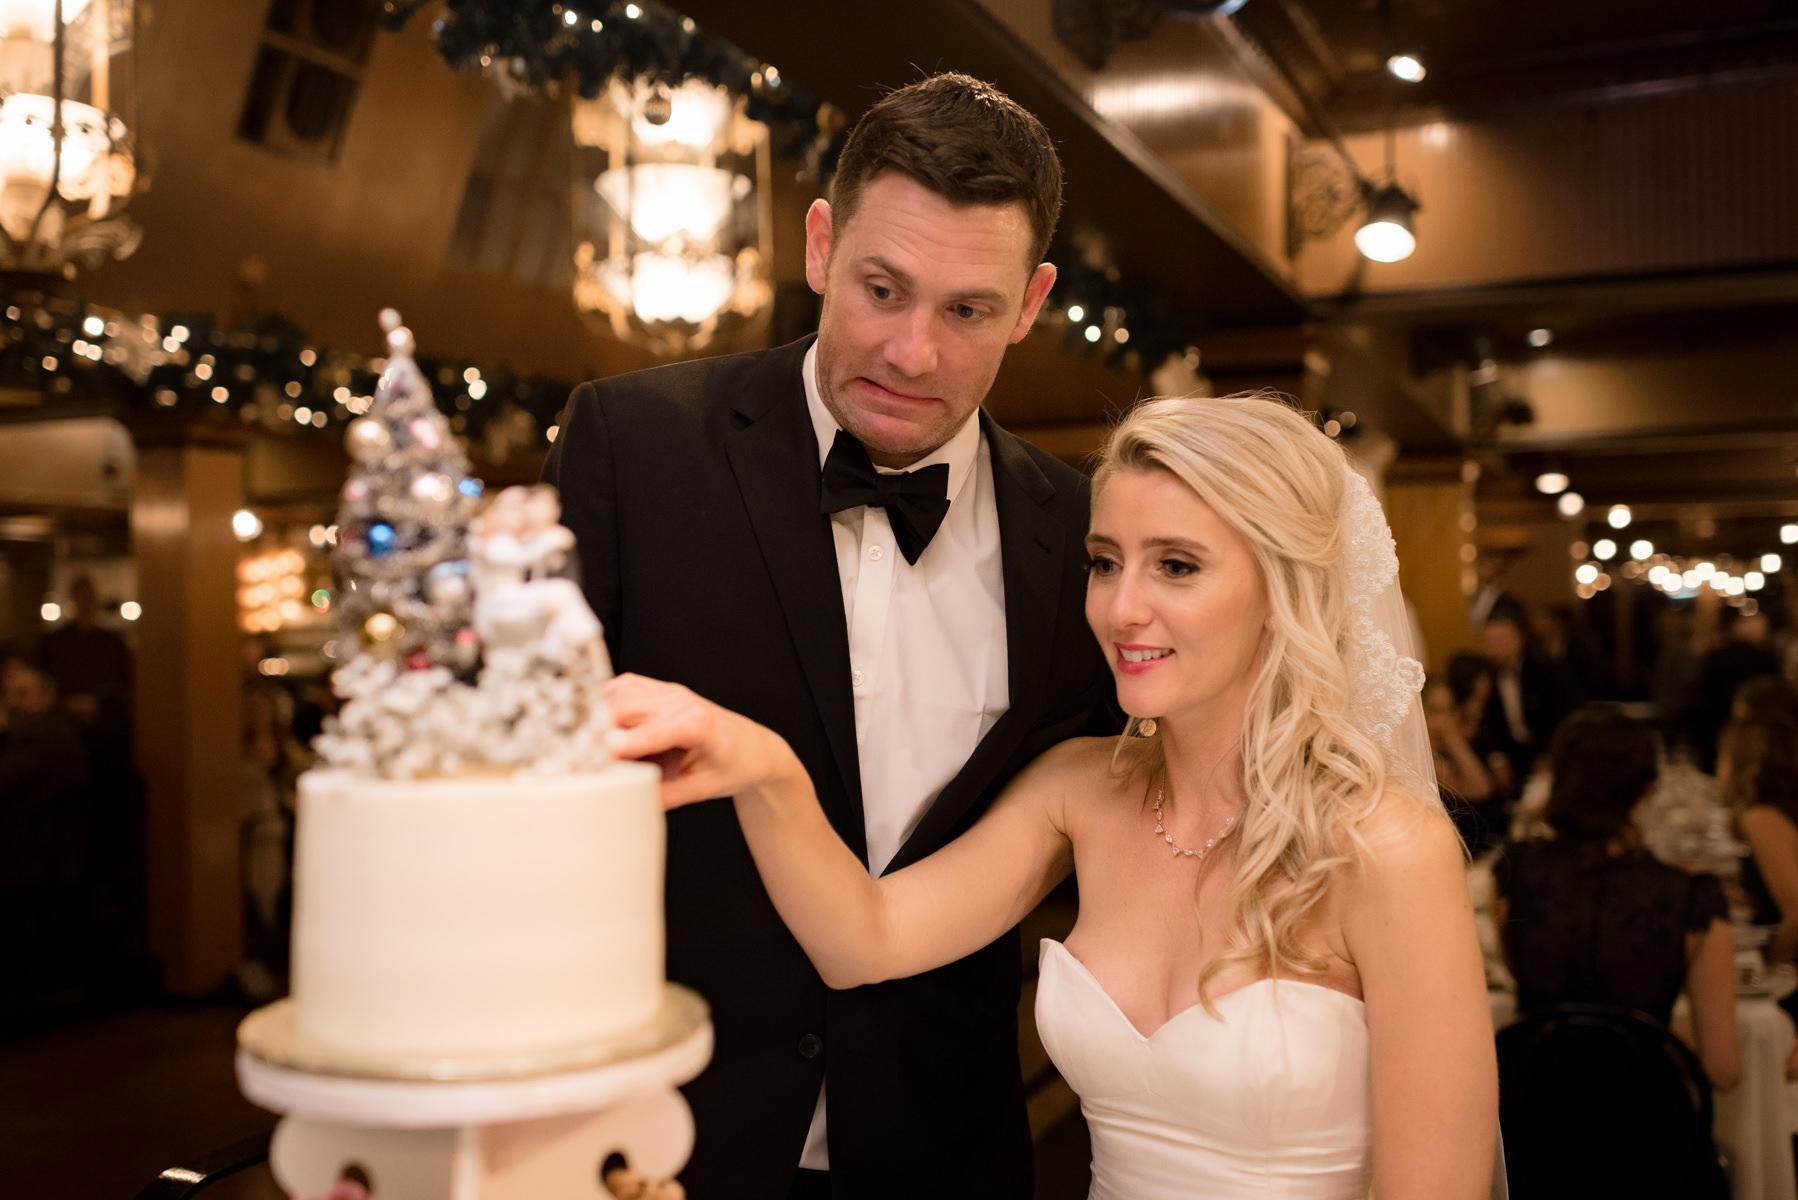 Andrew Tat - Documentary Wedding Photography - Lake Union Cafe - Seattle, Washington -Rachel and Ryan - 34.jpg